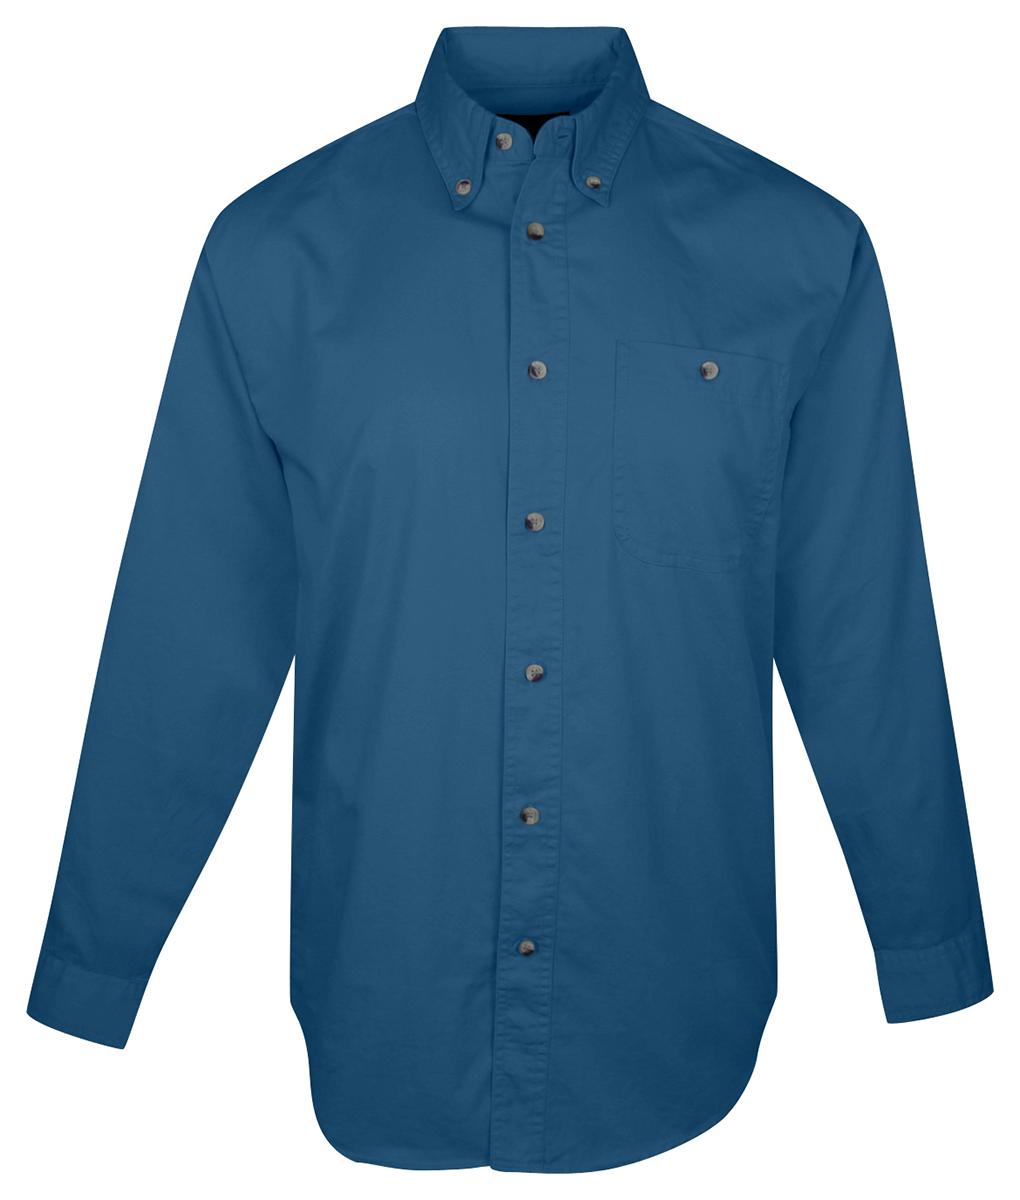 Tri-Mountain Menu0026#39;s Big And Tall Button-Down Collar Twill Dress Shirt. 810-Tall | EBay